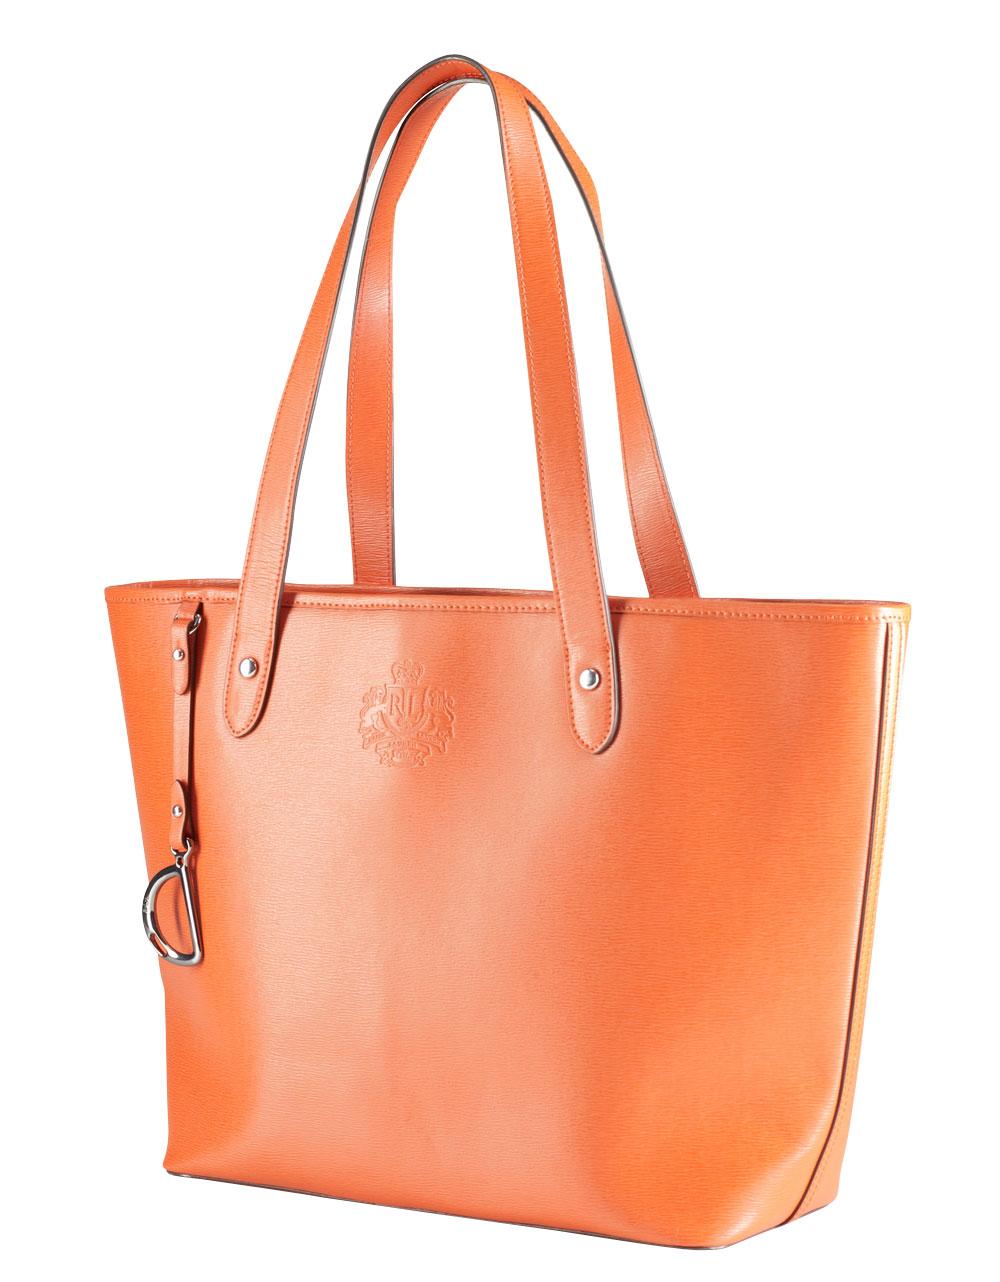 17e54fe9a6d9 ... ricky bag 656ac ebd92 inexpensive lauren by ralph lauren newbury leather  shopper bag in orange lyst ef9d8 01c4b ...